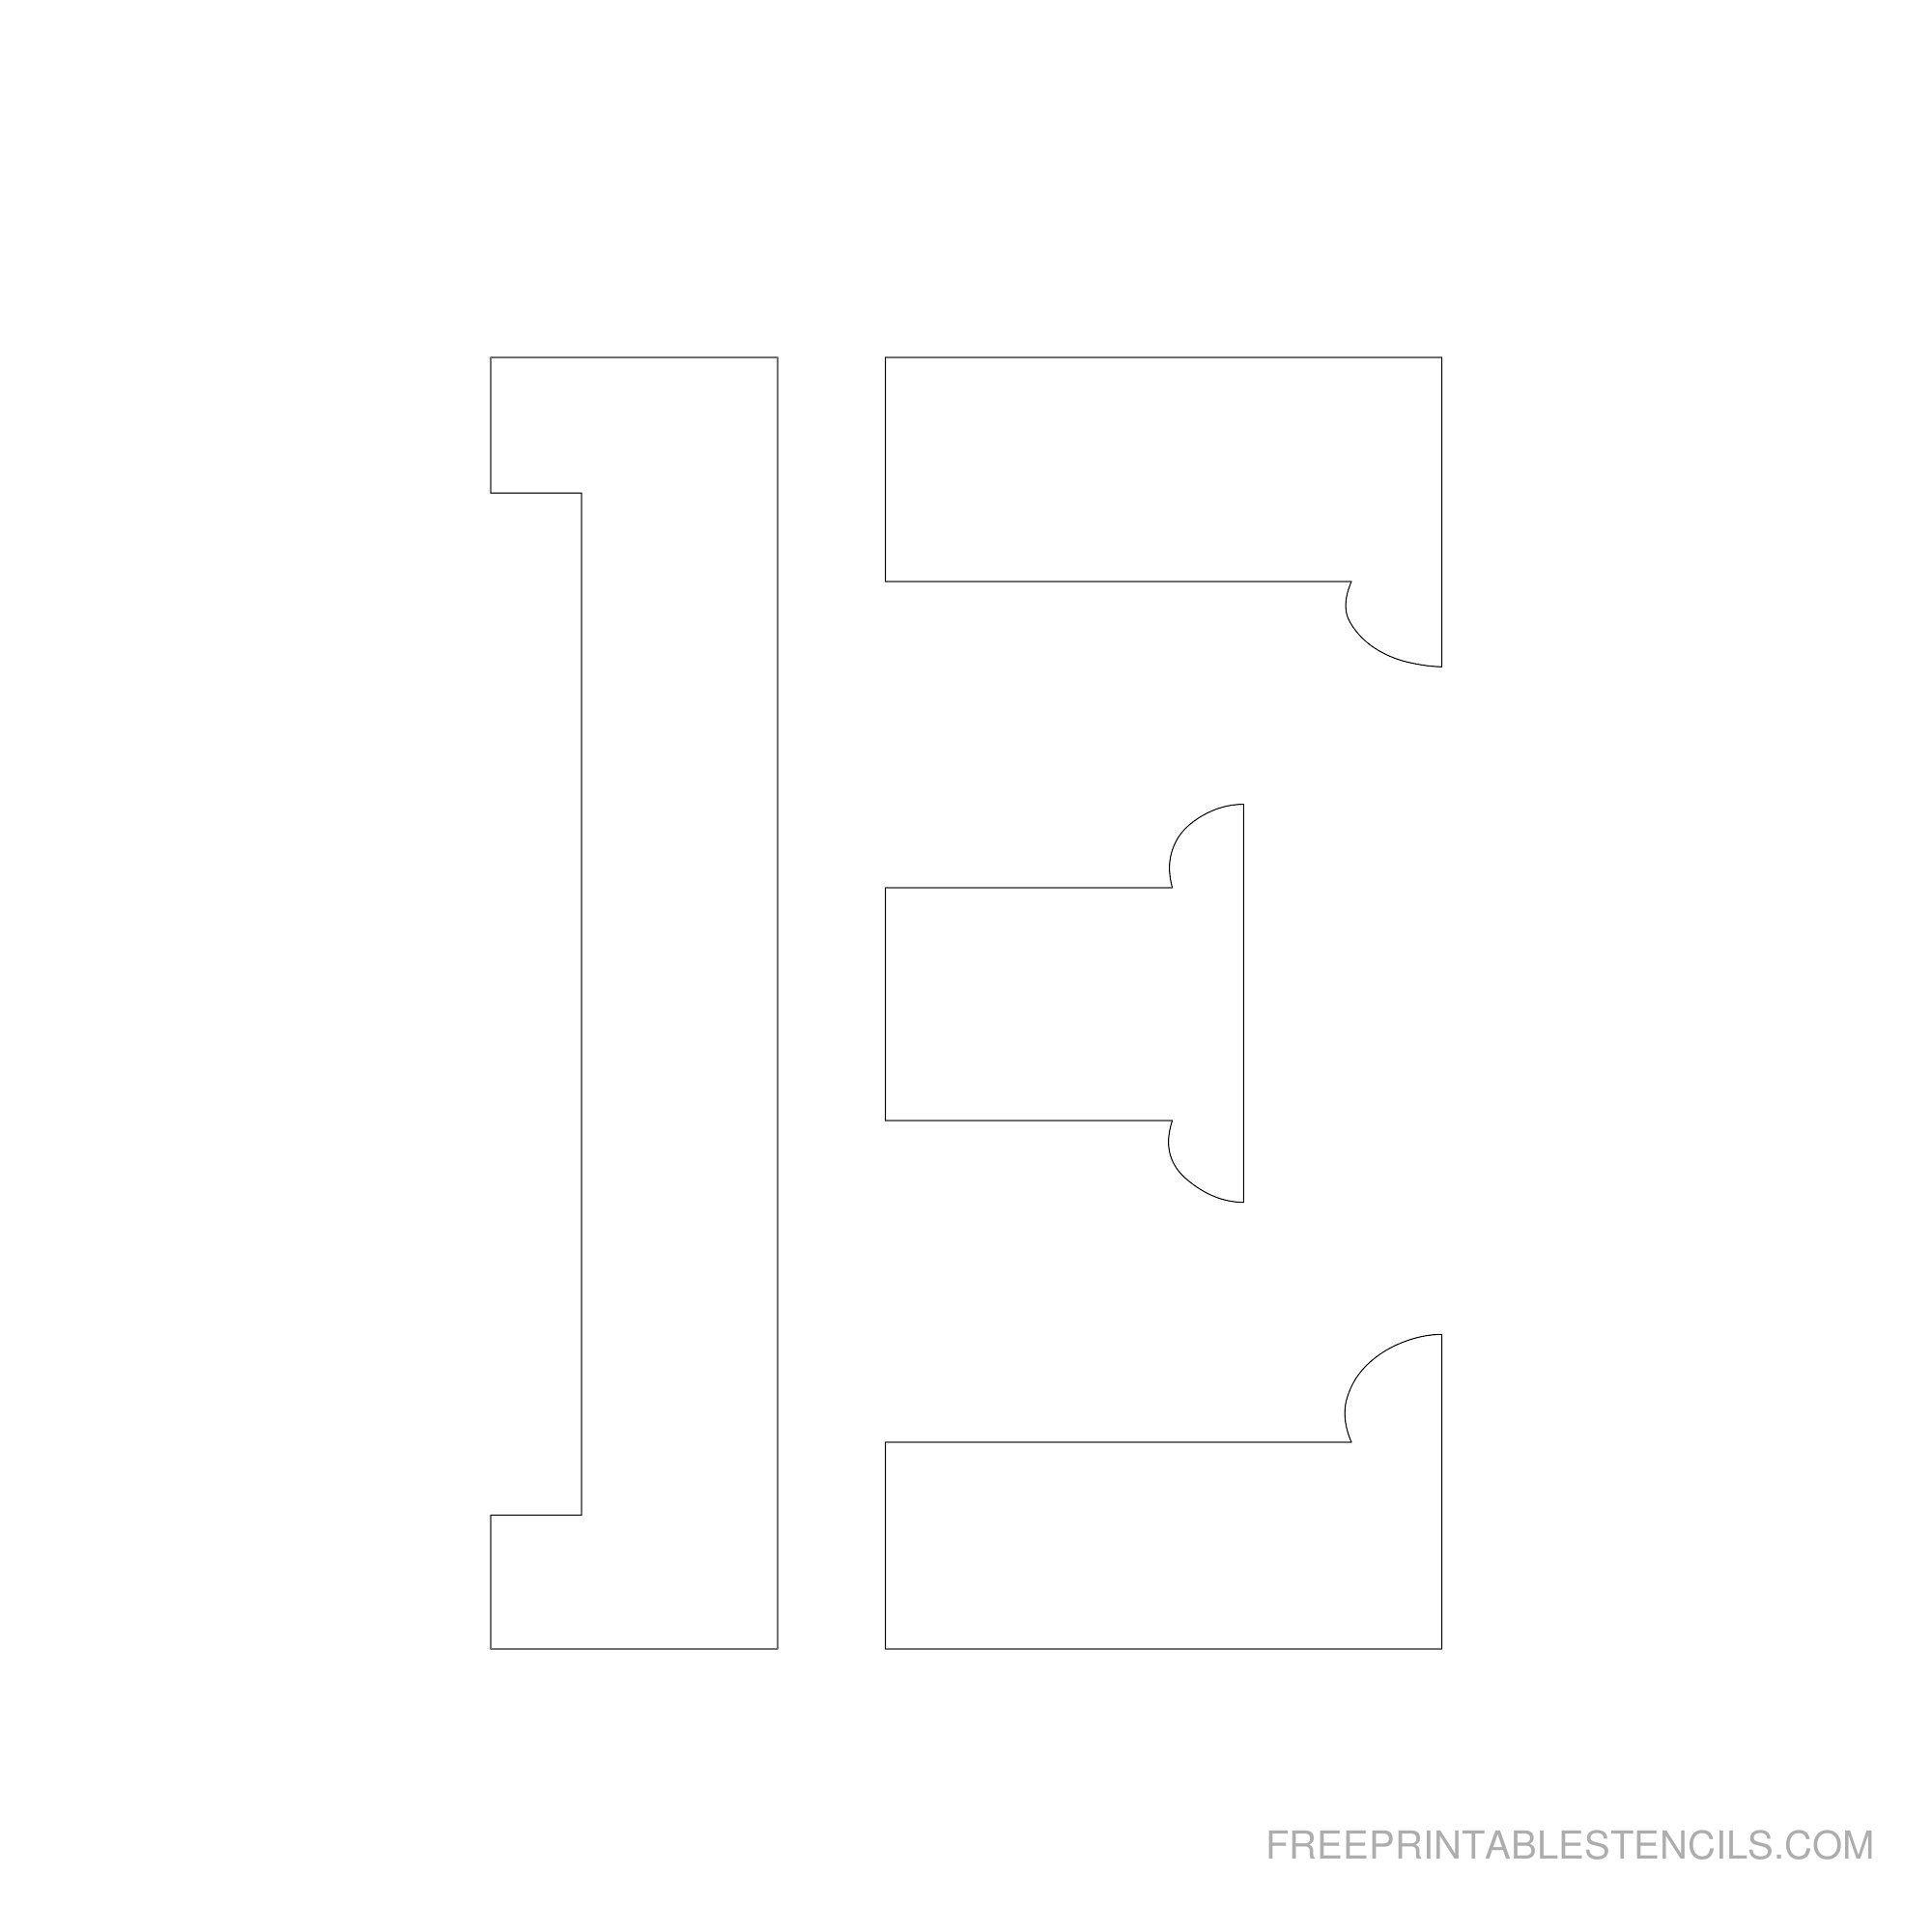 Printable 2 6 Inch Letter Stencils Free Stencils